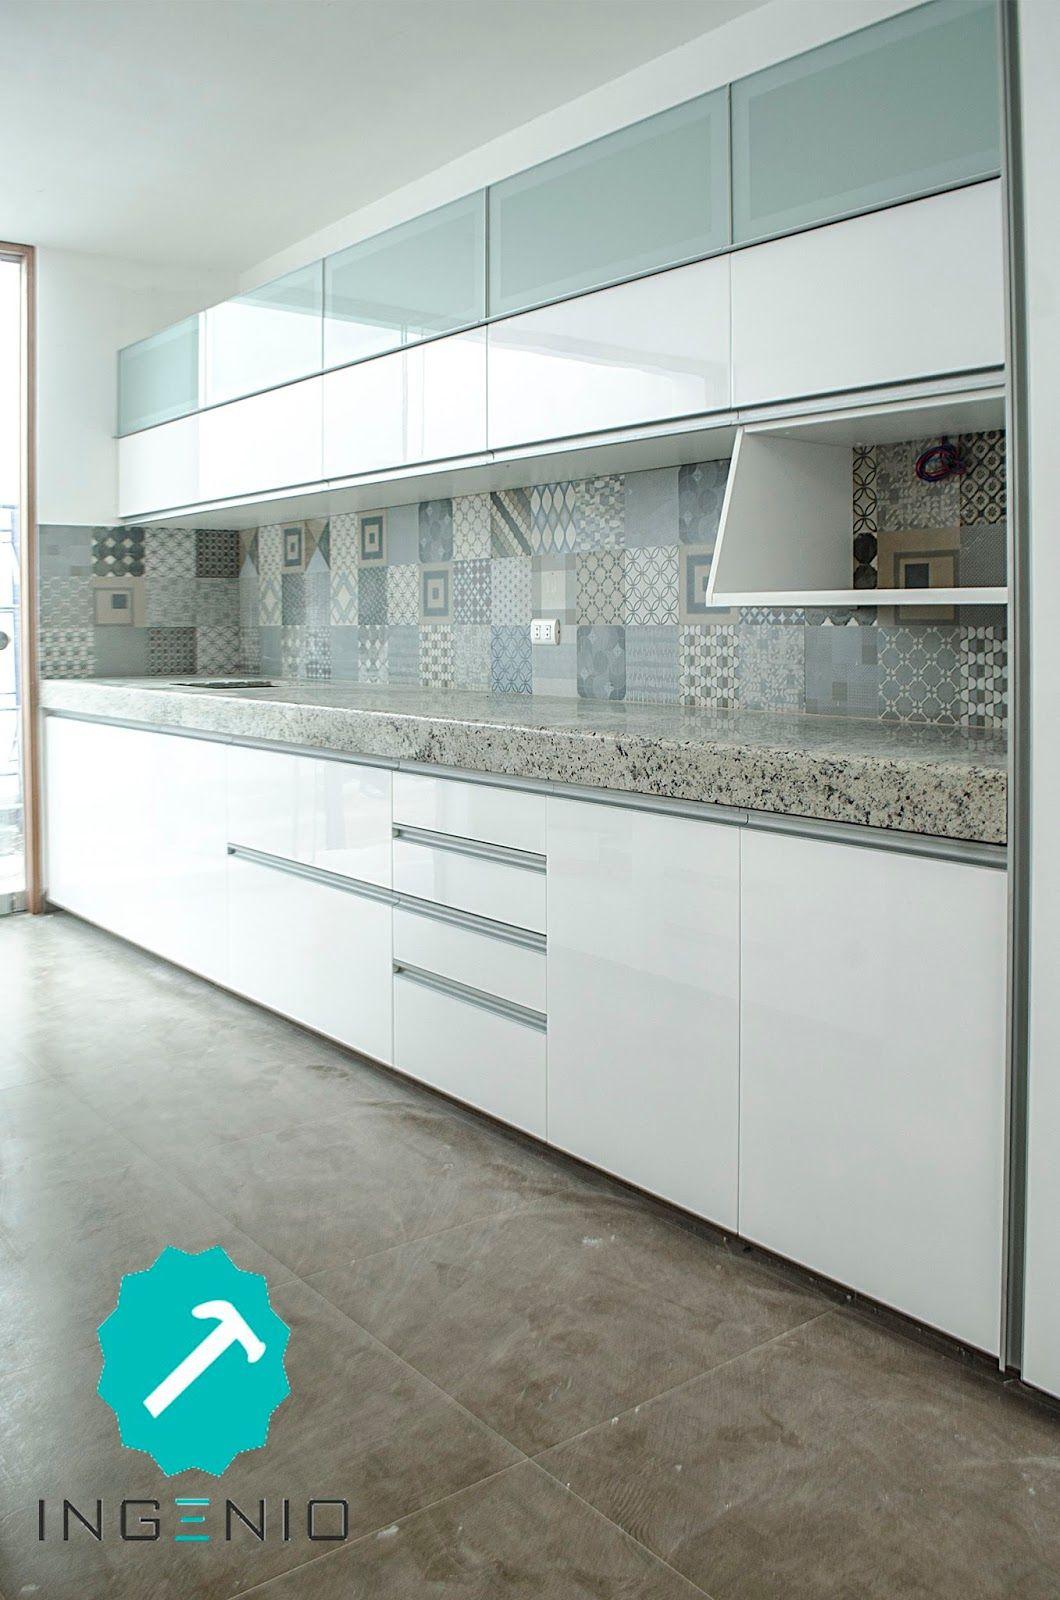 Mueble de cocina con acabado poliuretano blanco muebles for Muebles de cocina modernos pequenos